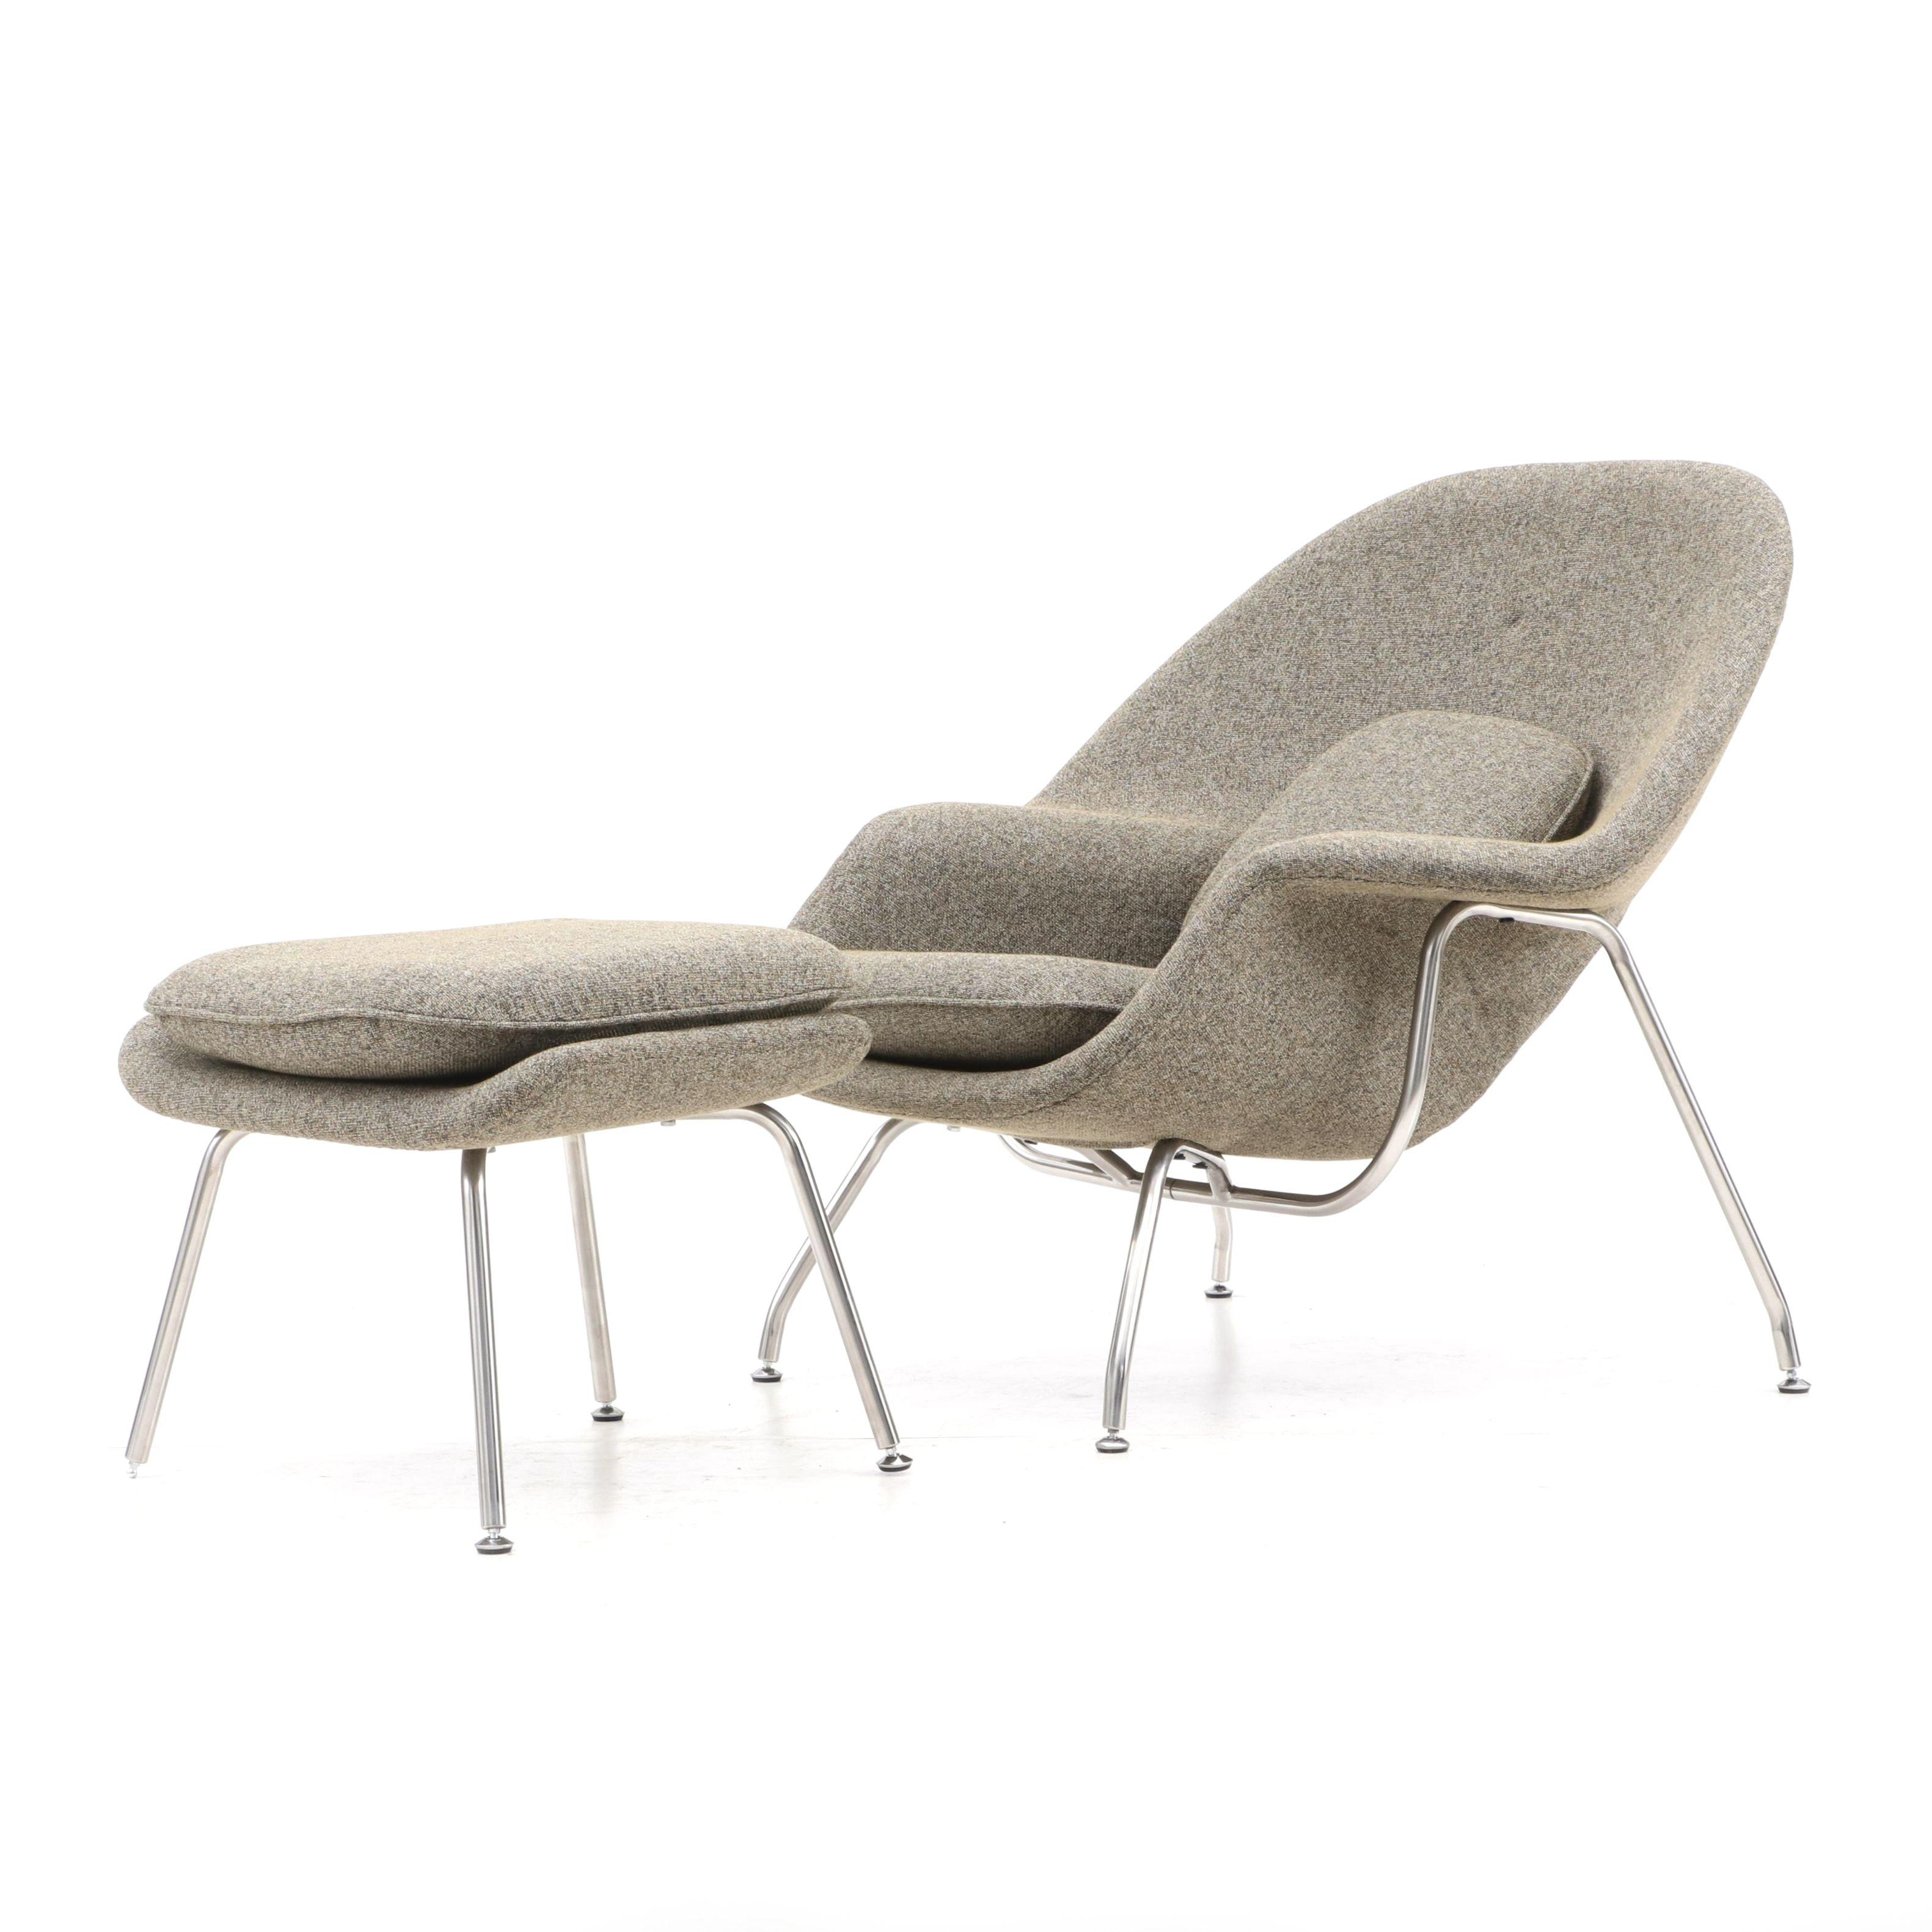 Eero Saarinen Style Womb Chair and Ottoman